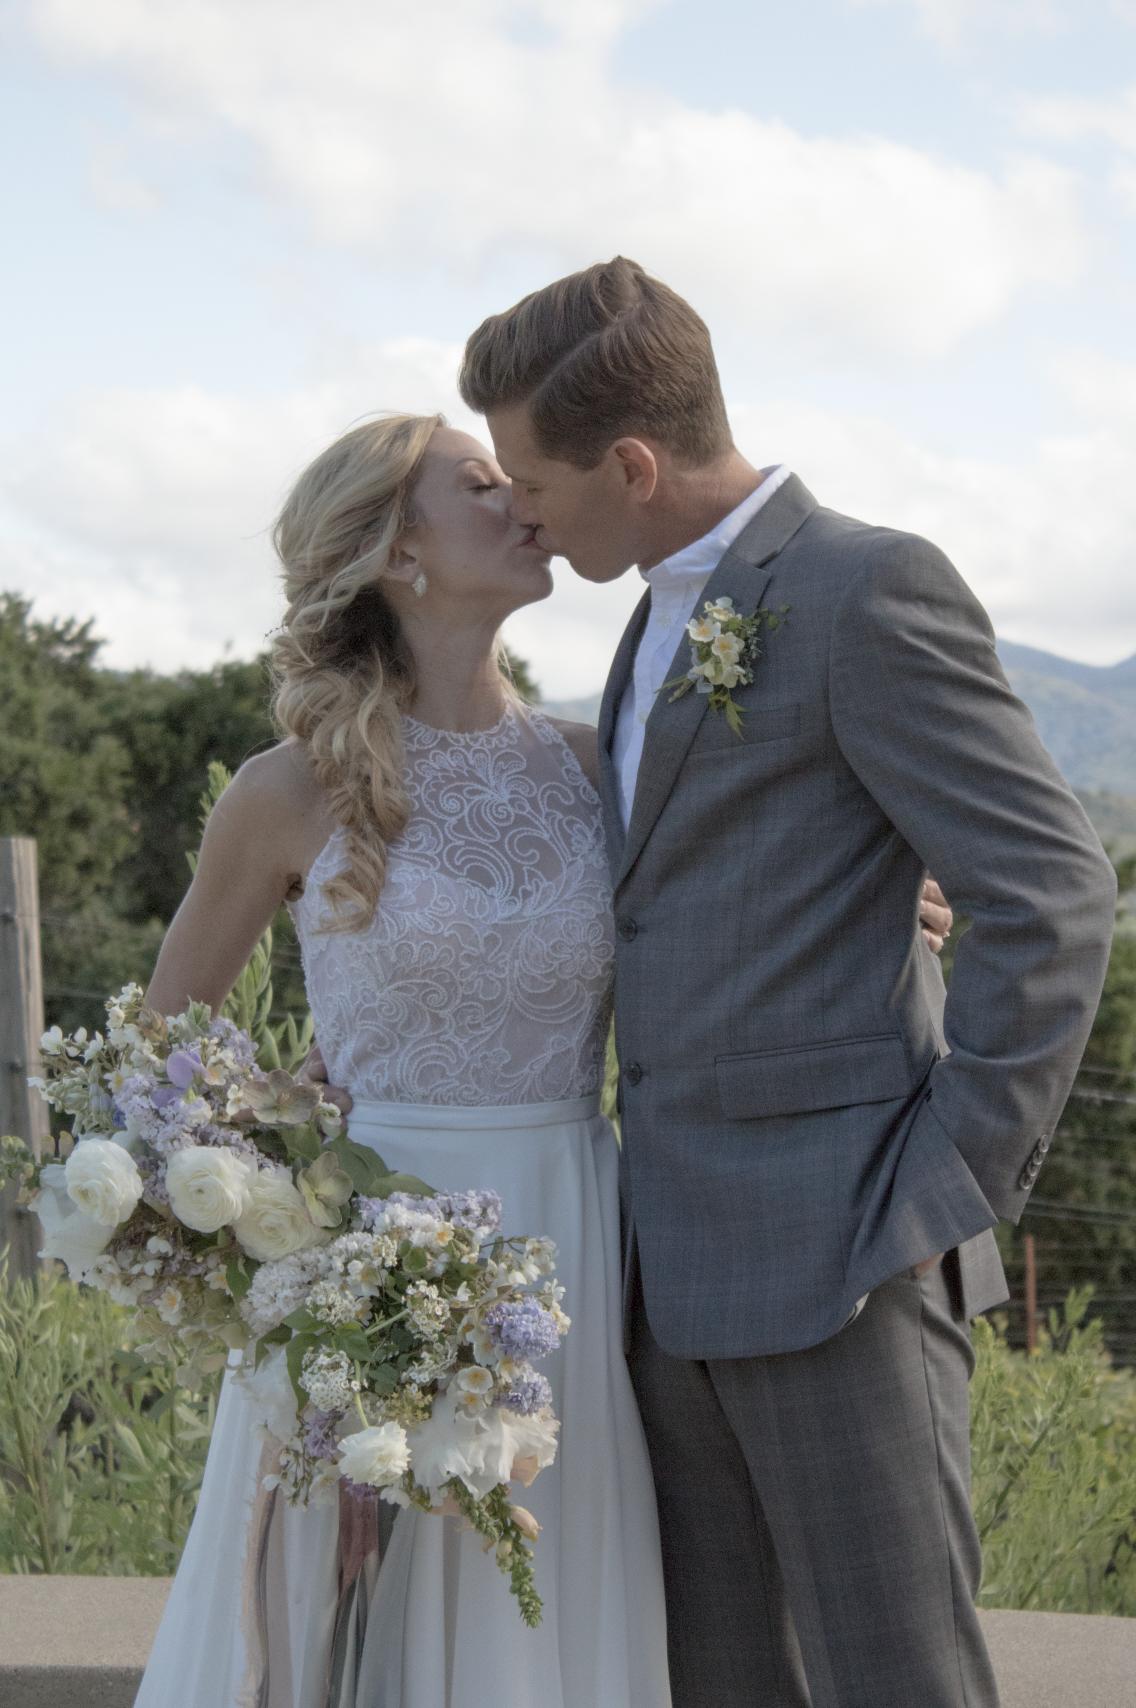 Venue: Holman Ranch / @holmanranch  Florals: Ponderosa & Thyme / @ponderosa_and_thyme  Invitation Suite & Signage: Graceline / @jenny_Sanders_  Wedding Dress: Kinsley James Couture Bridal / @kinsleyjamescouturebridal  Rings: Susie Saltzman / @susiesaltzman  Models: Bob Stoik + Nicole Duke / @nicyogi  Rentals: One True Love Vintage Rentals / otlvintage Cake: Just Bakecause / @justbakecause  Hair & Makeup: The Hair + Makeup Company / @thehairandmakeupco  Event Concept + Design: Michaela Noelle Designs & Ashley Slater Photography / @michaelanoelledesigns  @ashleyslaterphotography of  @bloomtheworkshop